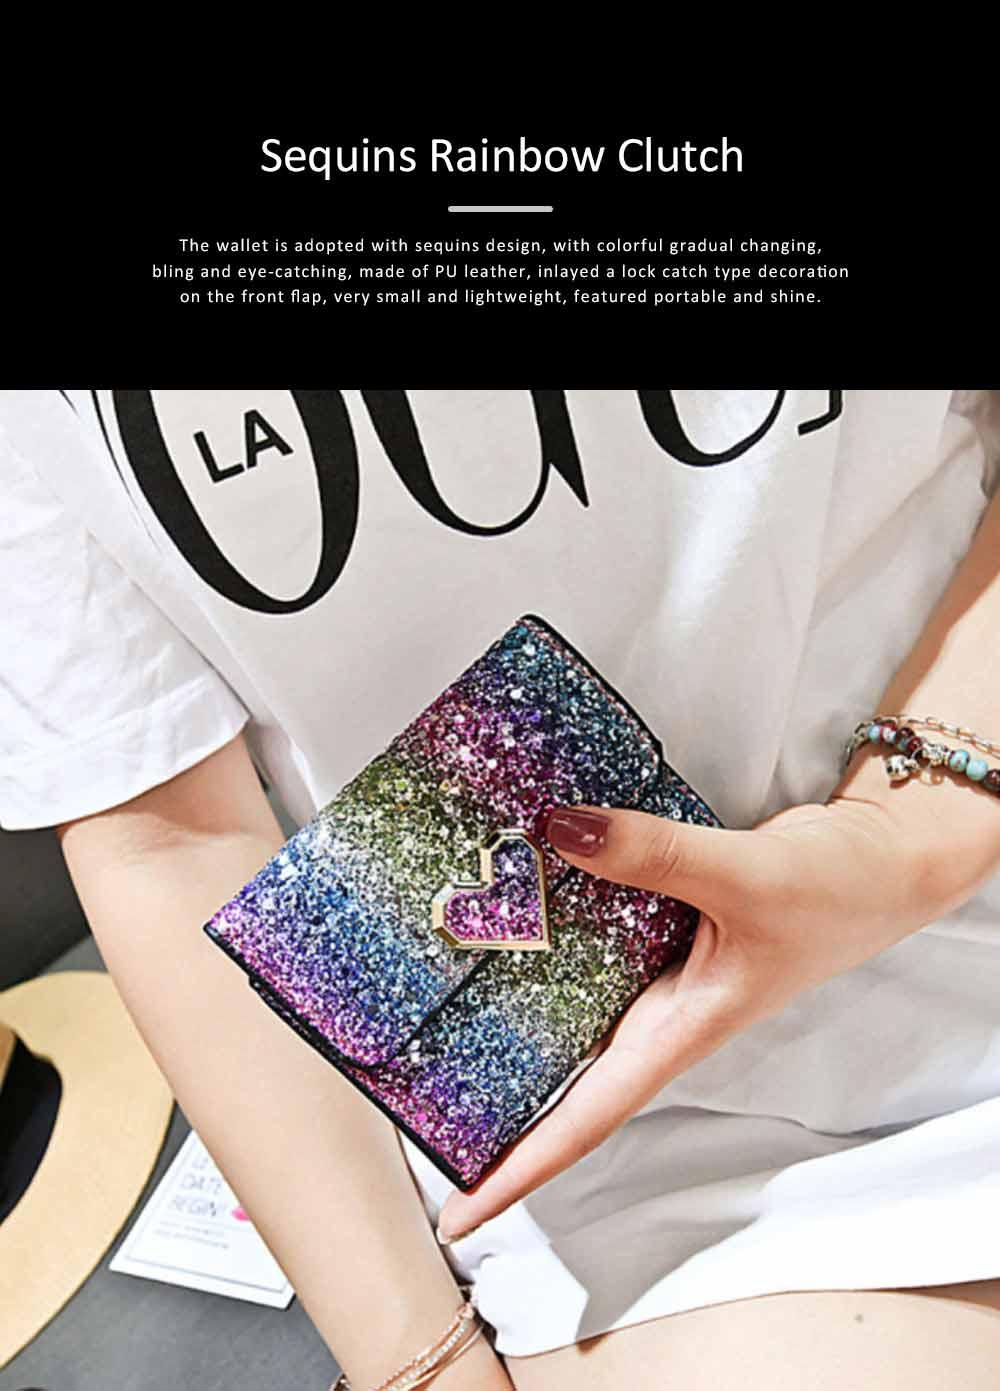 Chic Short Purse Folio Mini Handbag Sequins Colorful 3 Slots PU Leather Rainbow Clutch Bag Evening Party Accessories 0